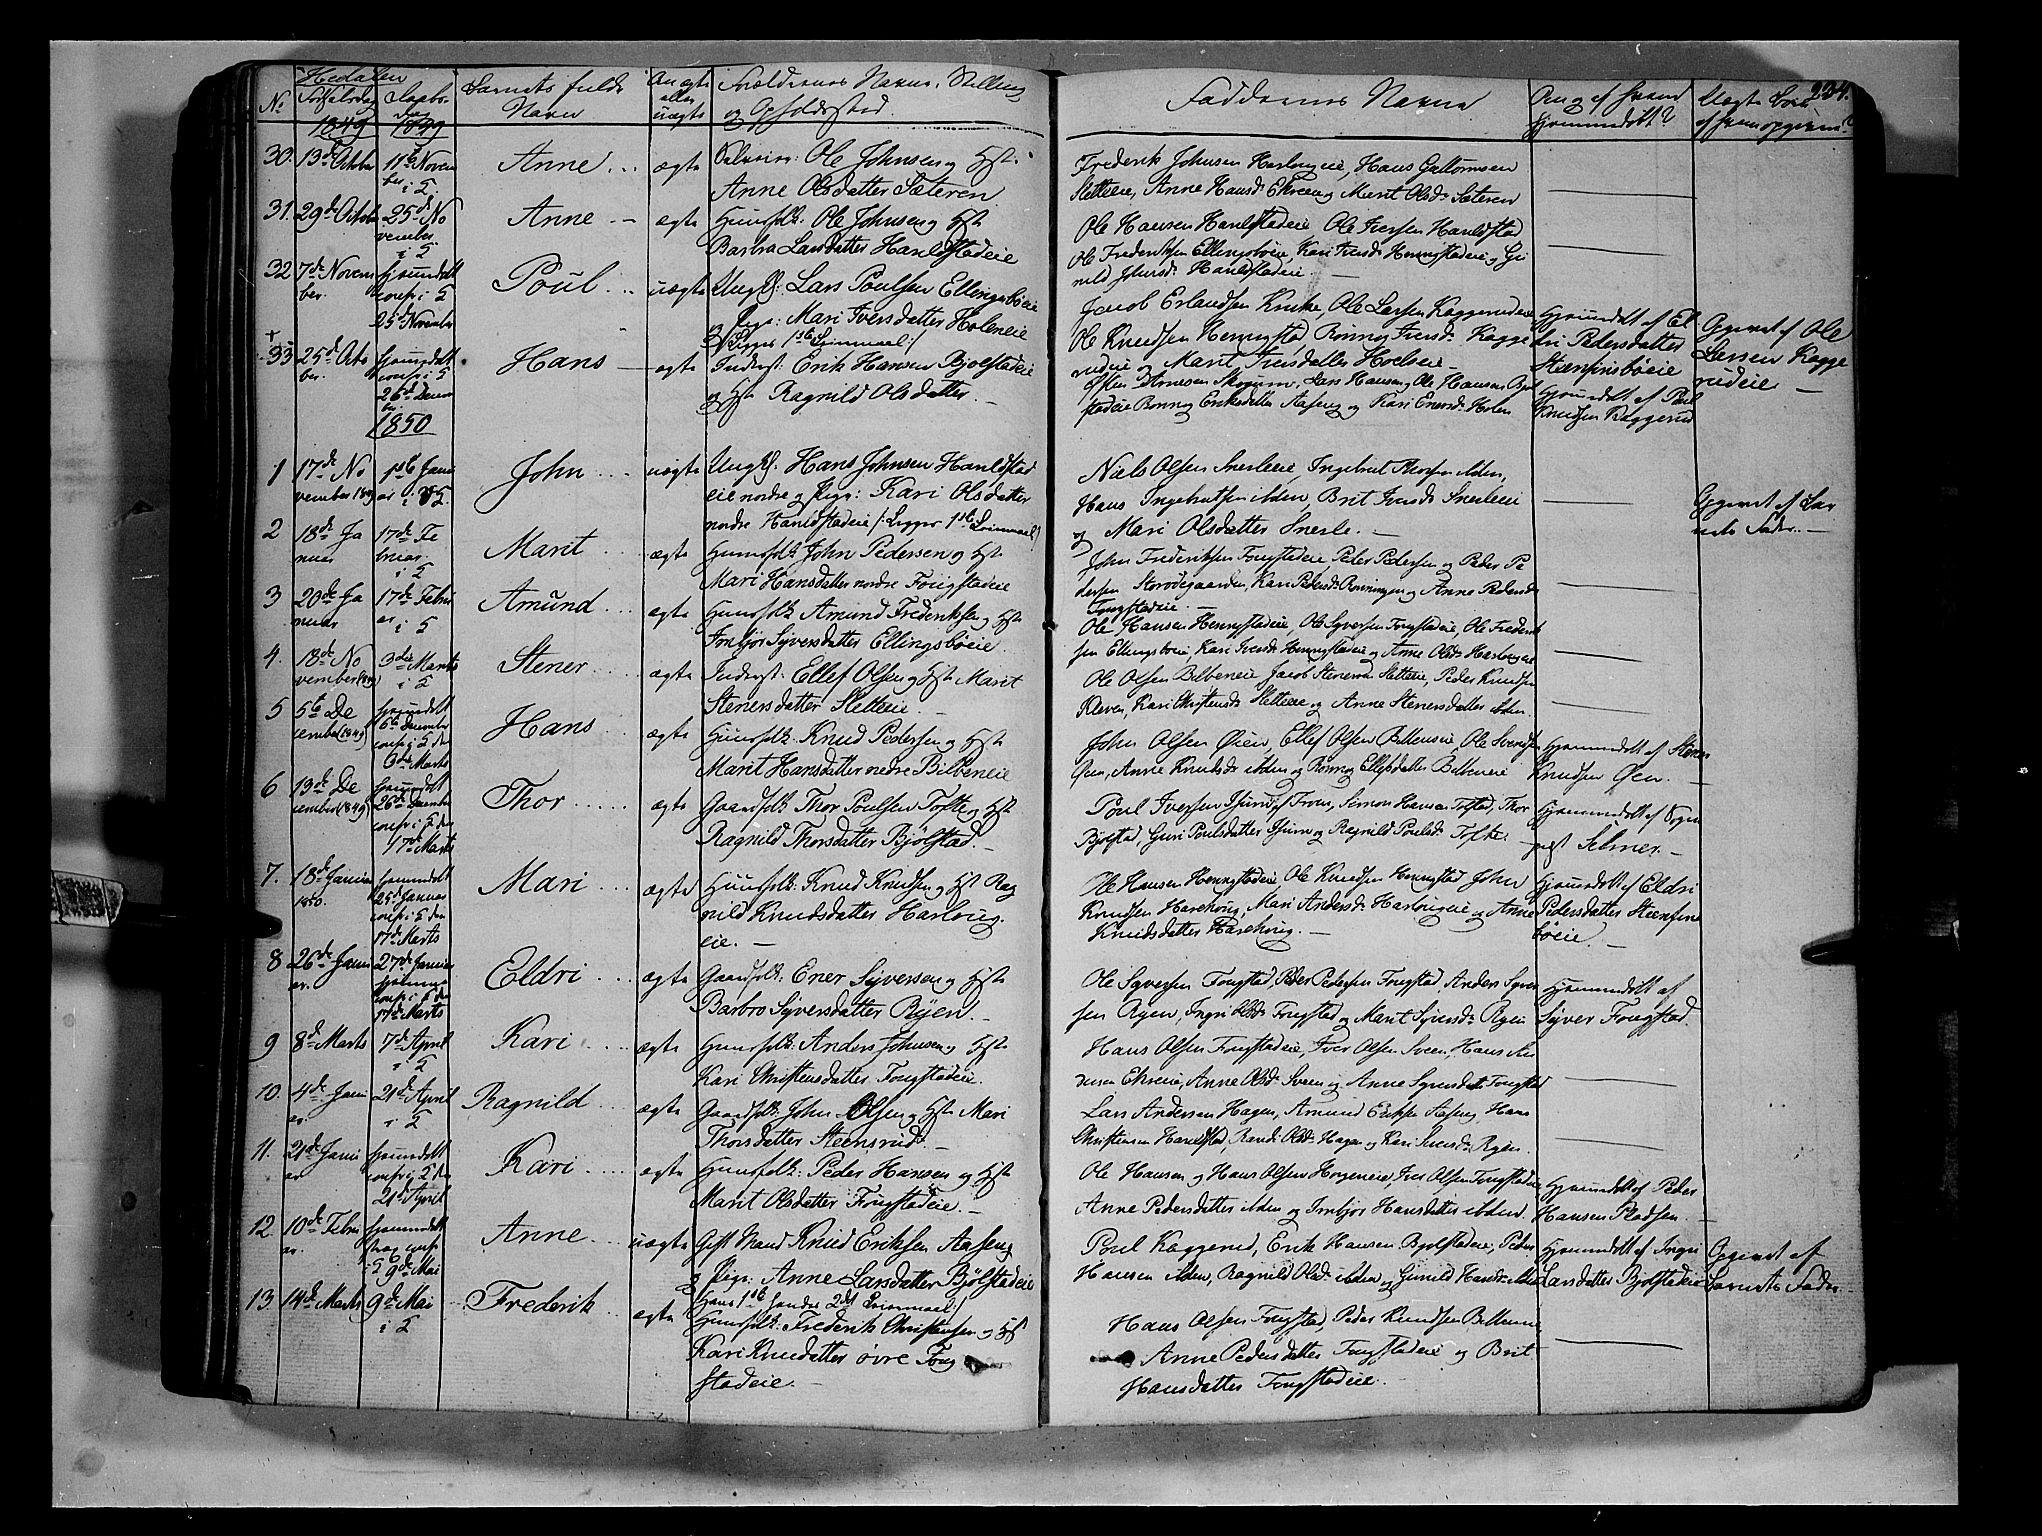 SAH, Vågå prestekontor, Ministerialbok nr. 5 /2, 1842-1856, s. 234